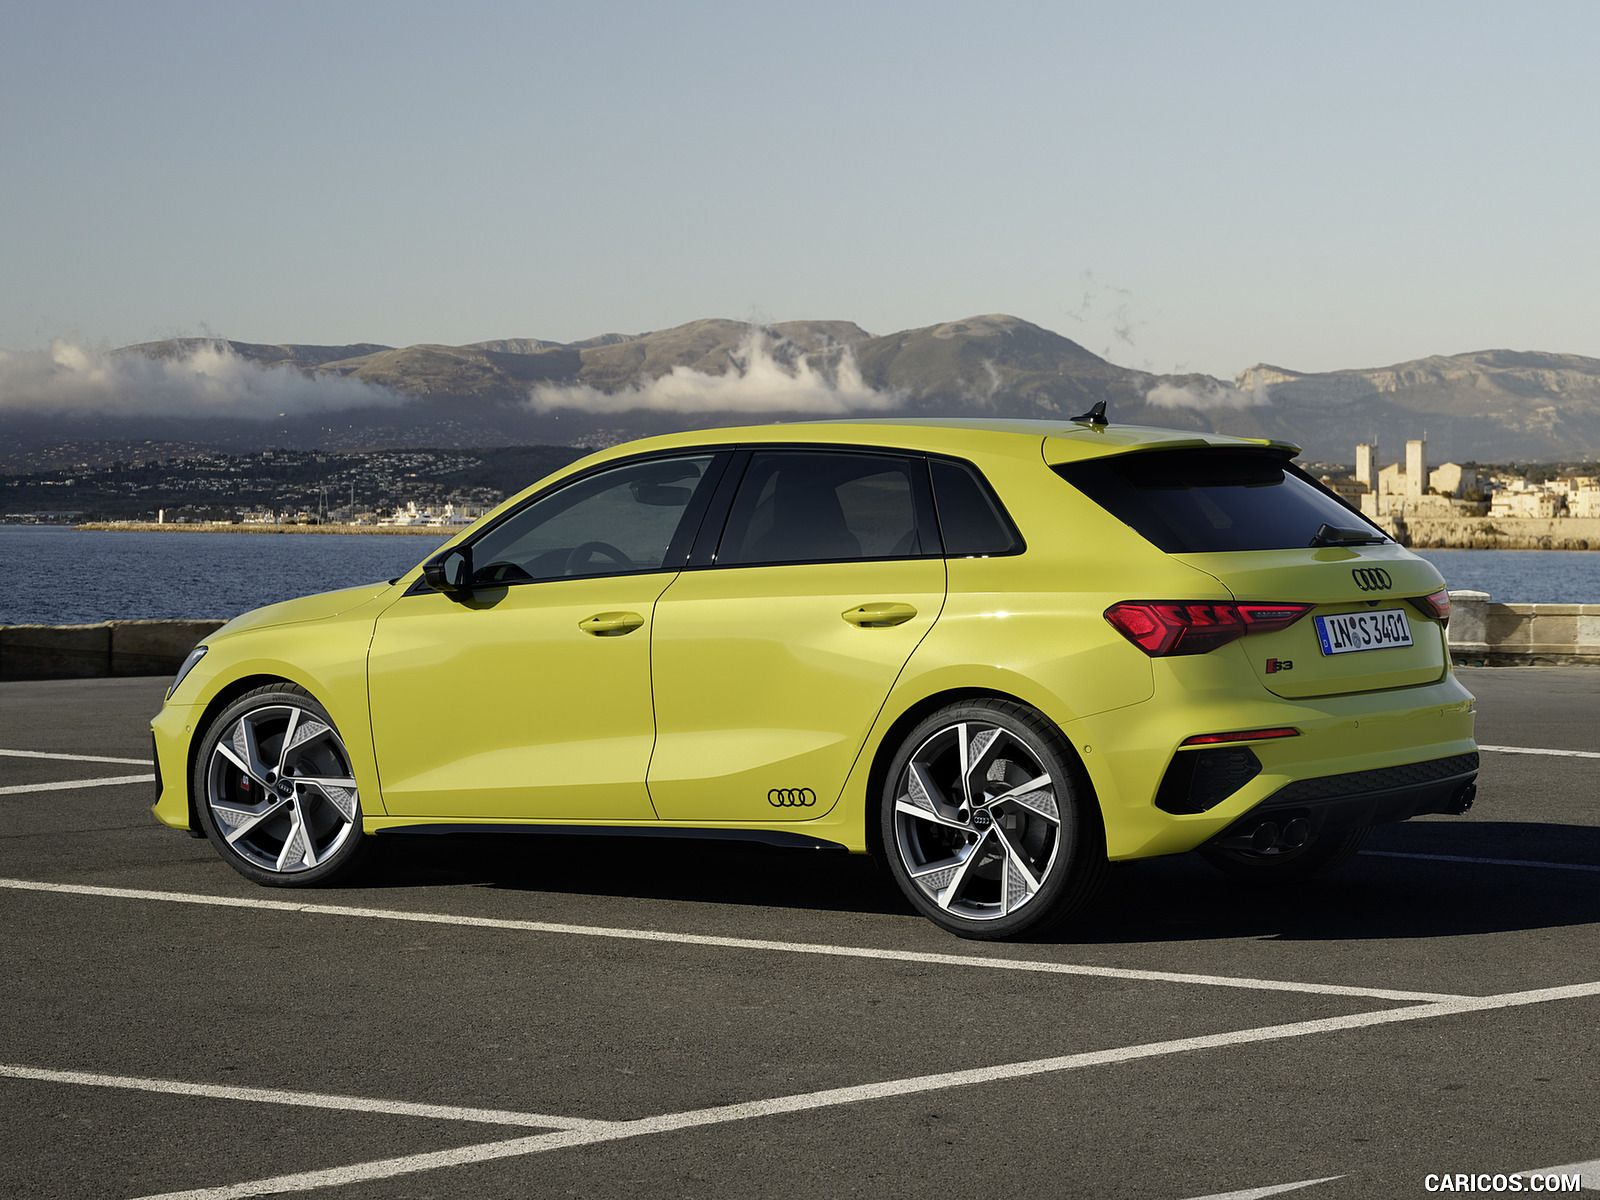 2021 Audi S3 Sportback Wallpaper Audi Car Exterior Sedan